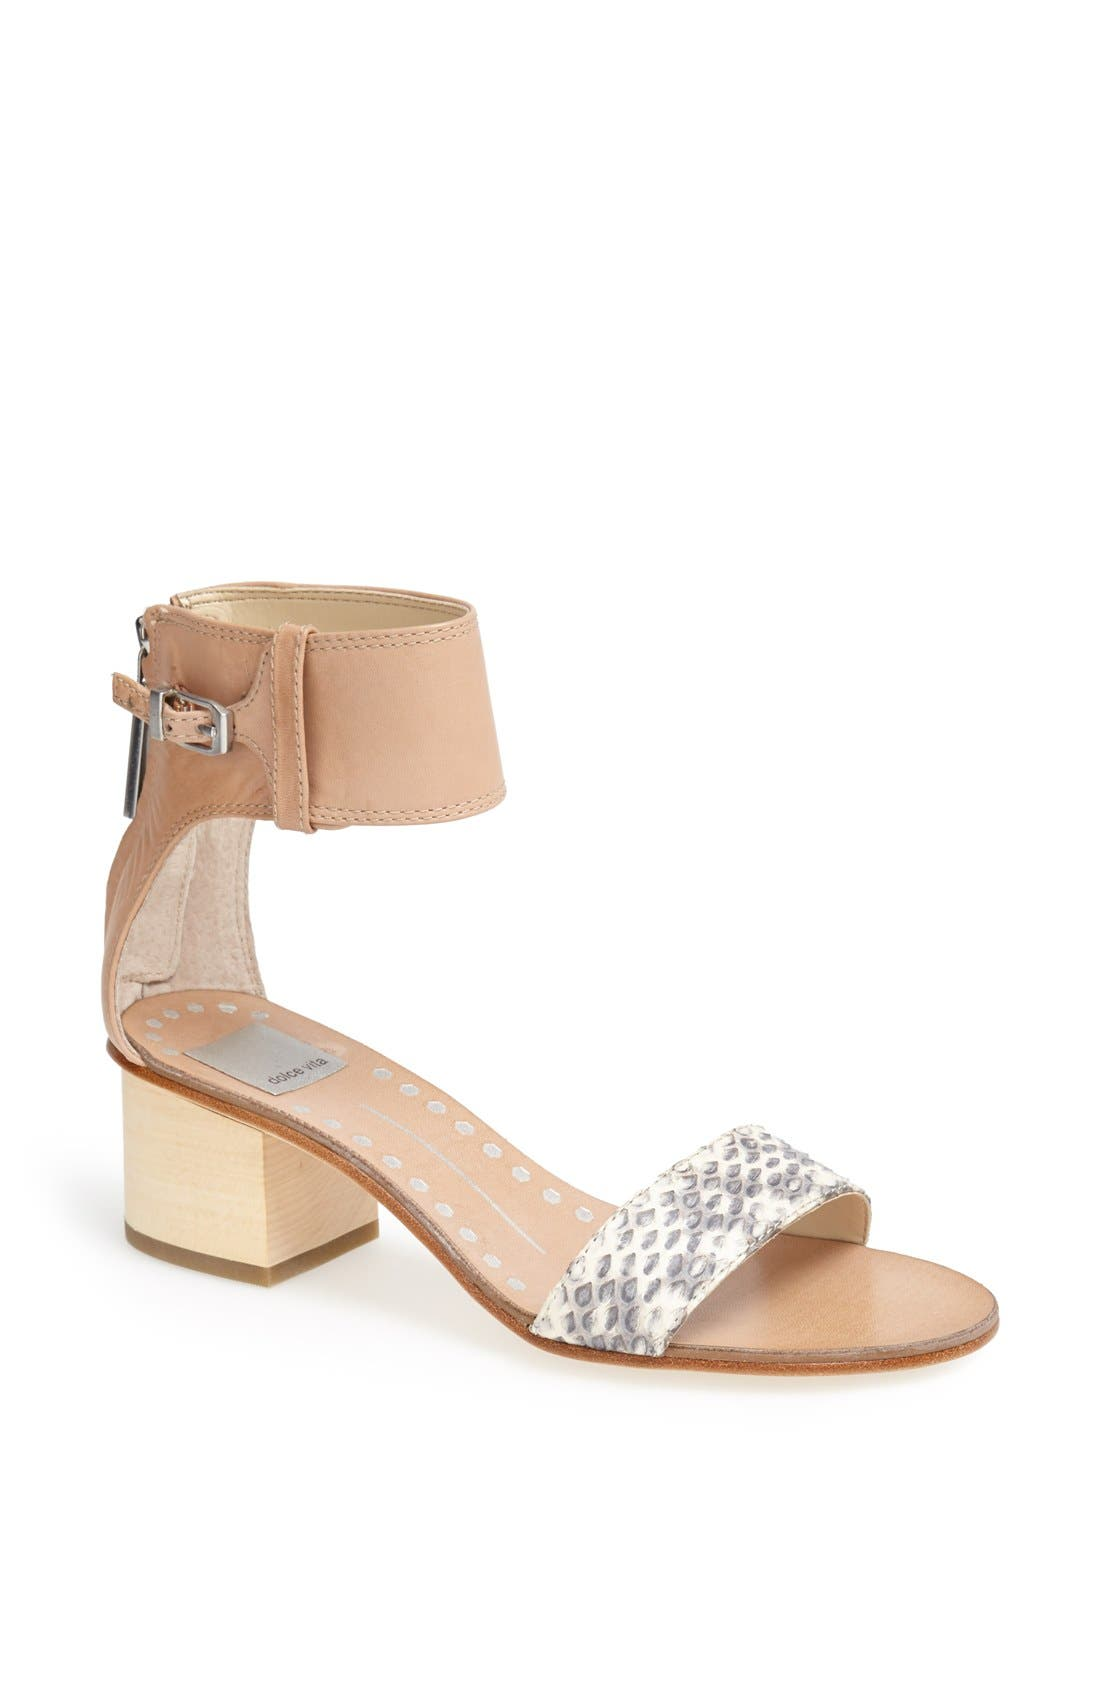 Alternate Image 1 Selected - Dolce Vita 'Foxie' Sandal